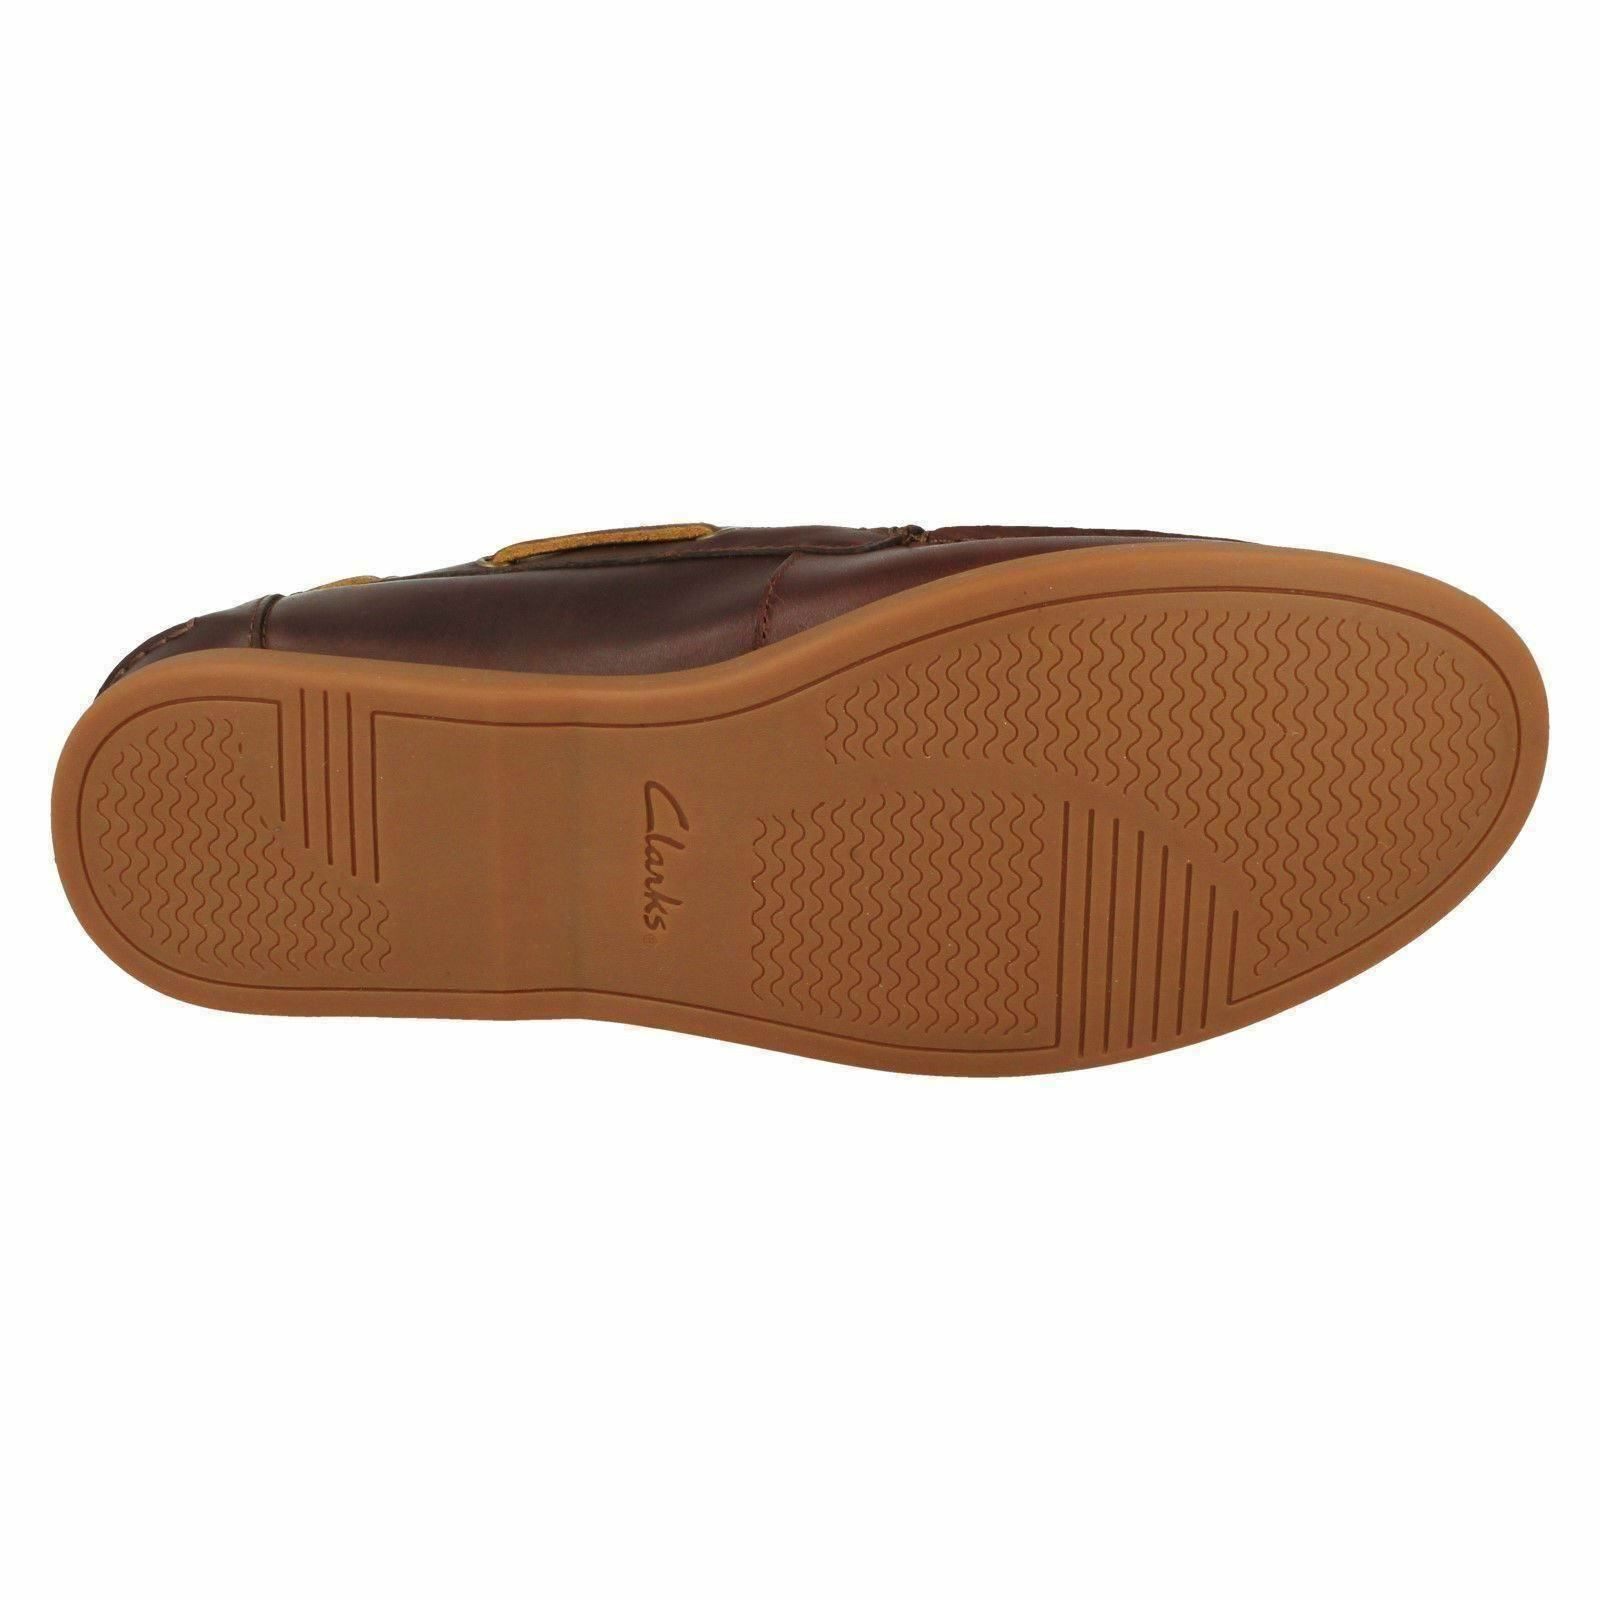 Clarks Morven Sail Shoe Mens Tan Leather Boat Shoe Sail 4ac11b